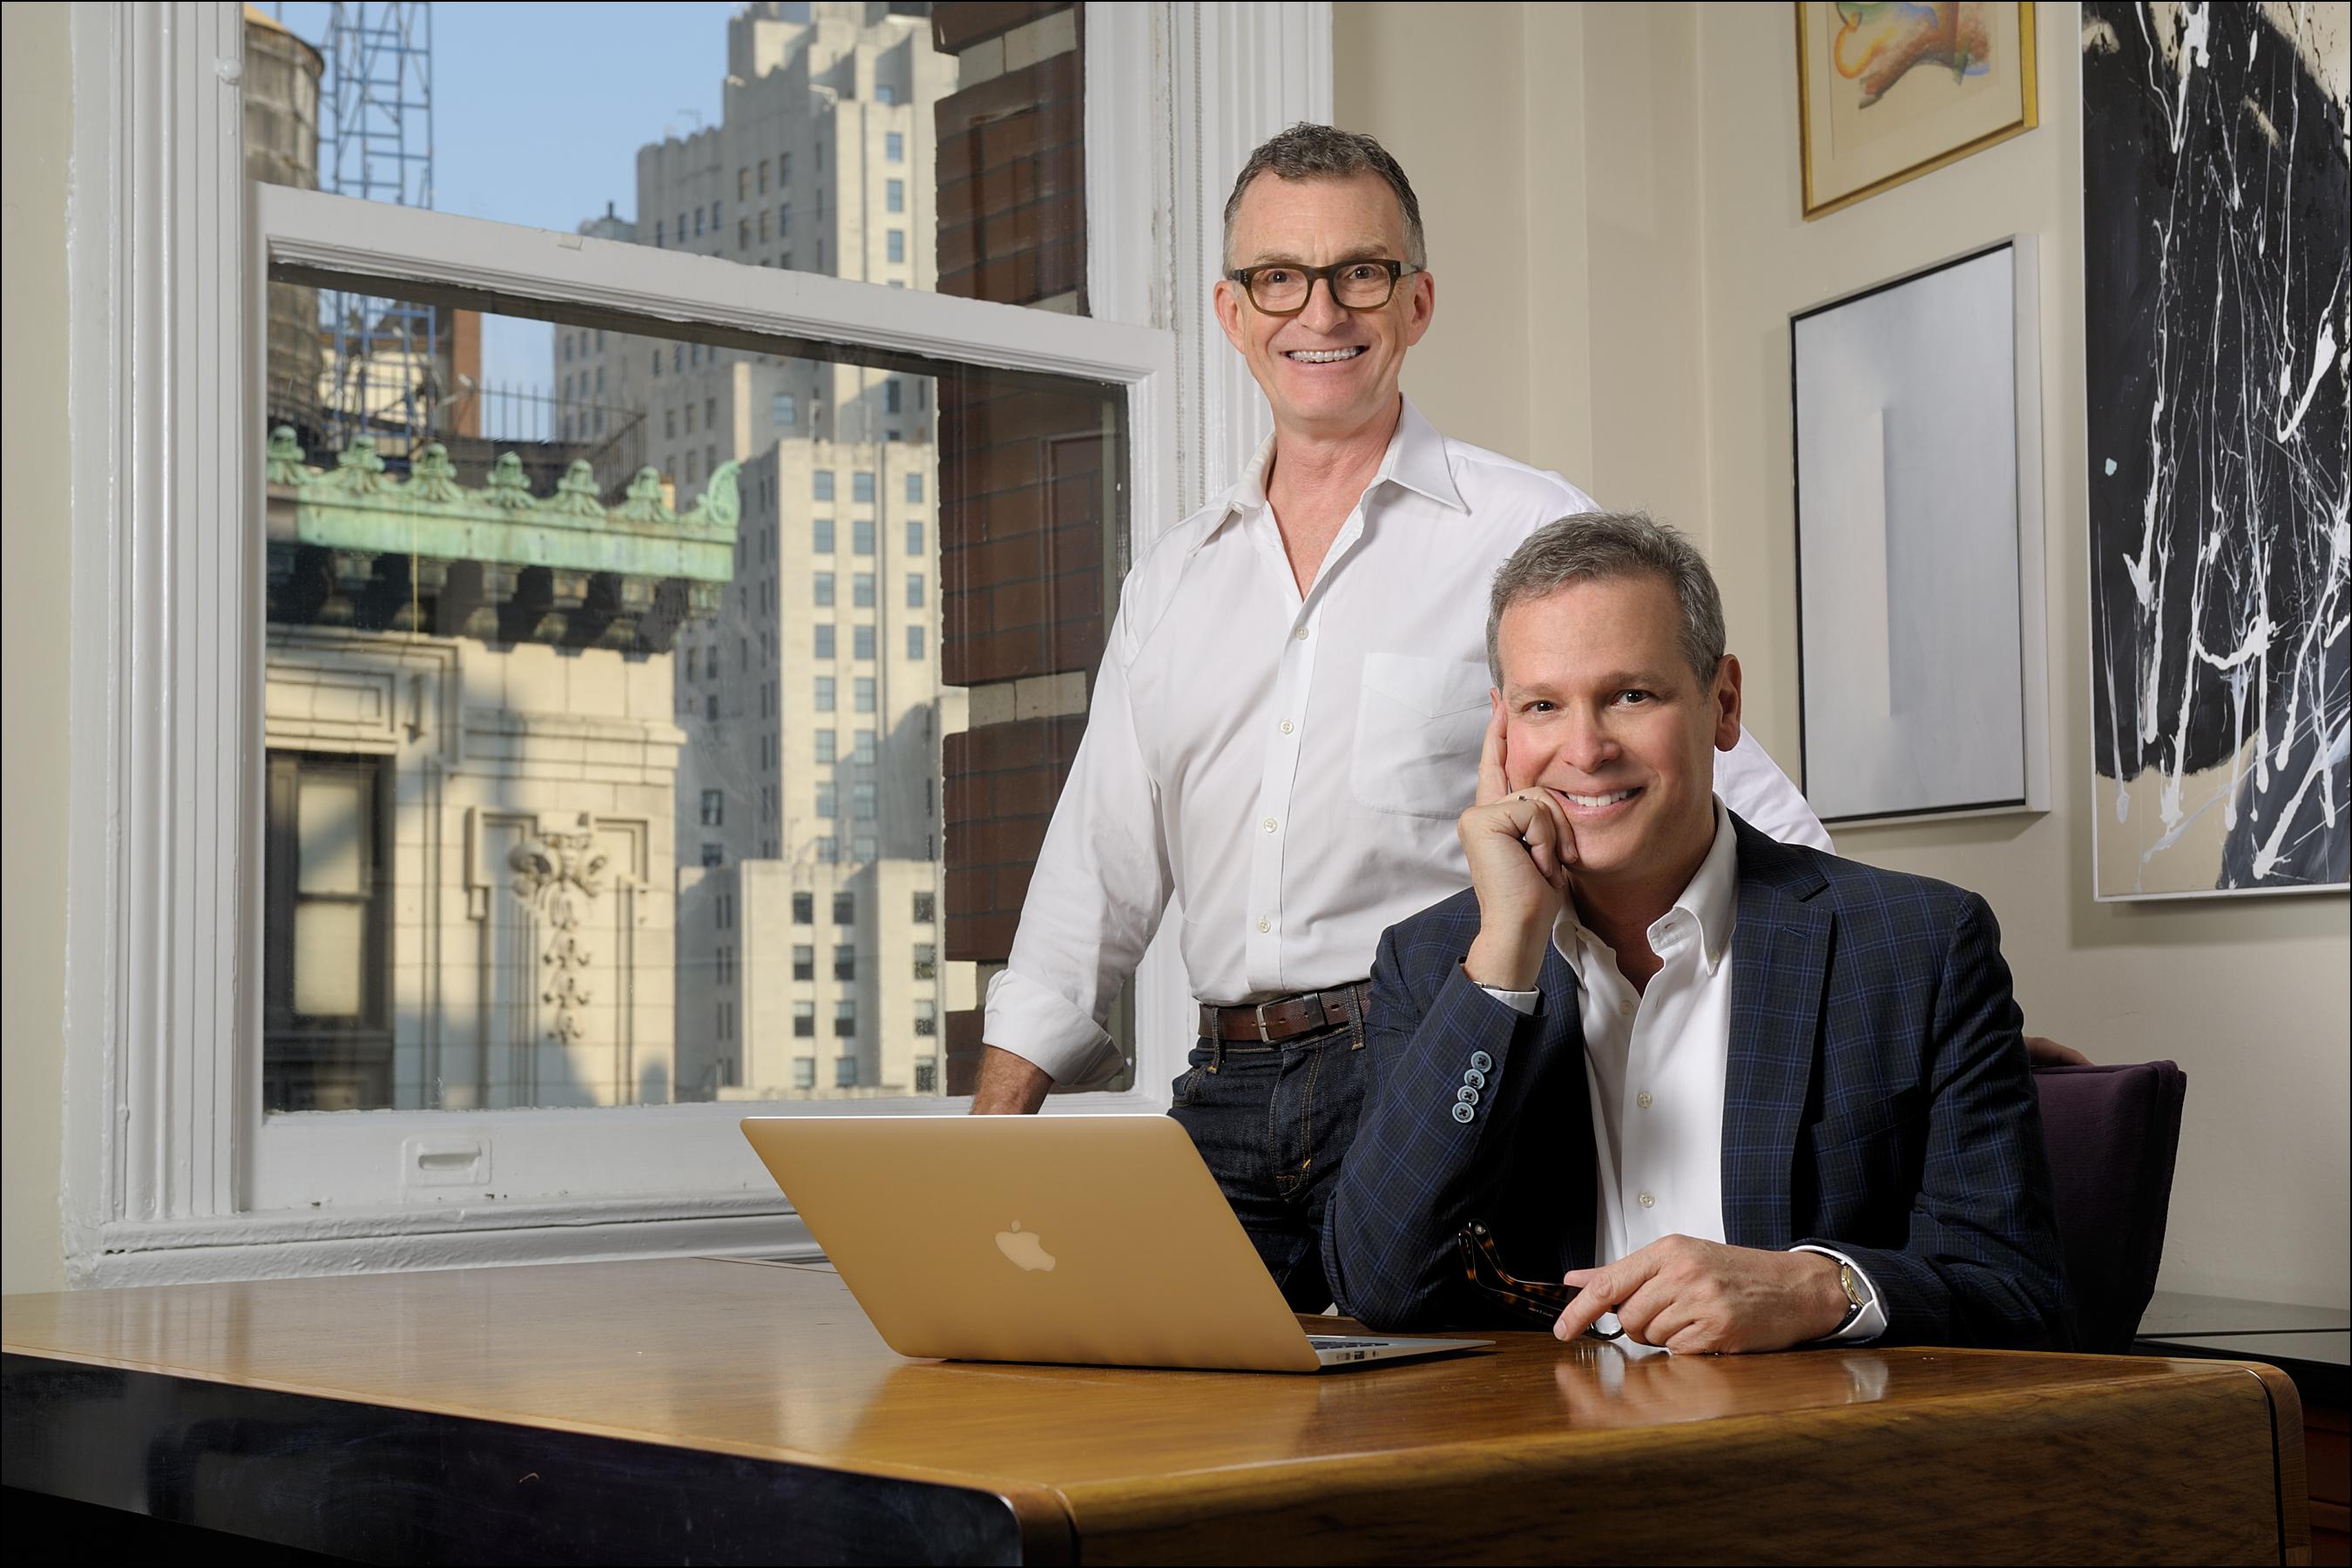 interior designers Barry Goralnick and Glenn Gissler